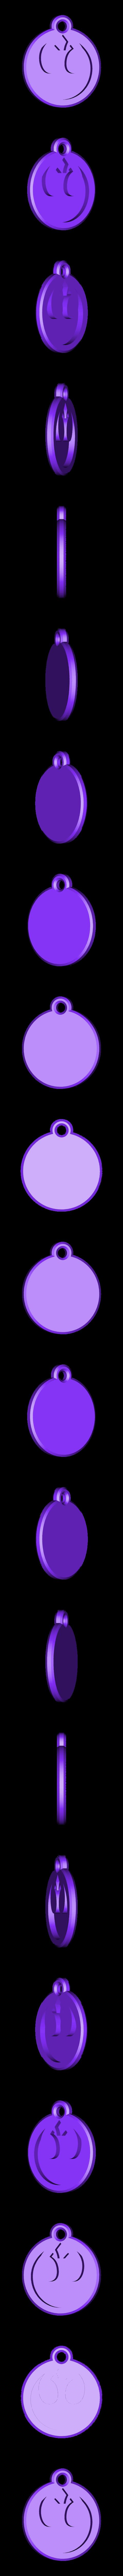 Rebel_Keychain.stl Download free OBJ file 3DMX / STAR WARS / Keychains • 3D printer object, 3DMX